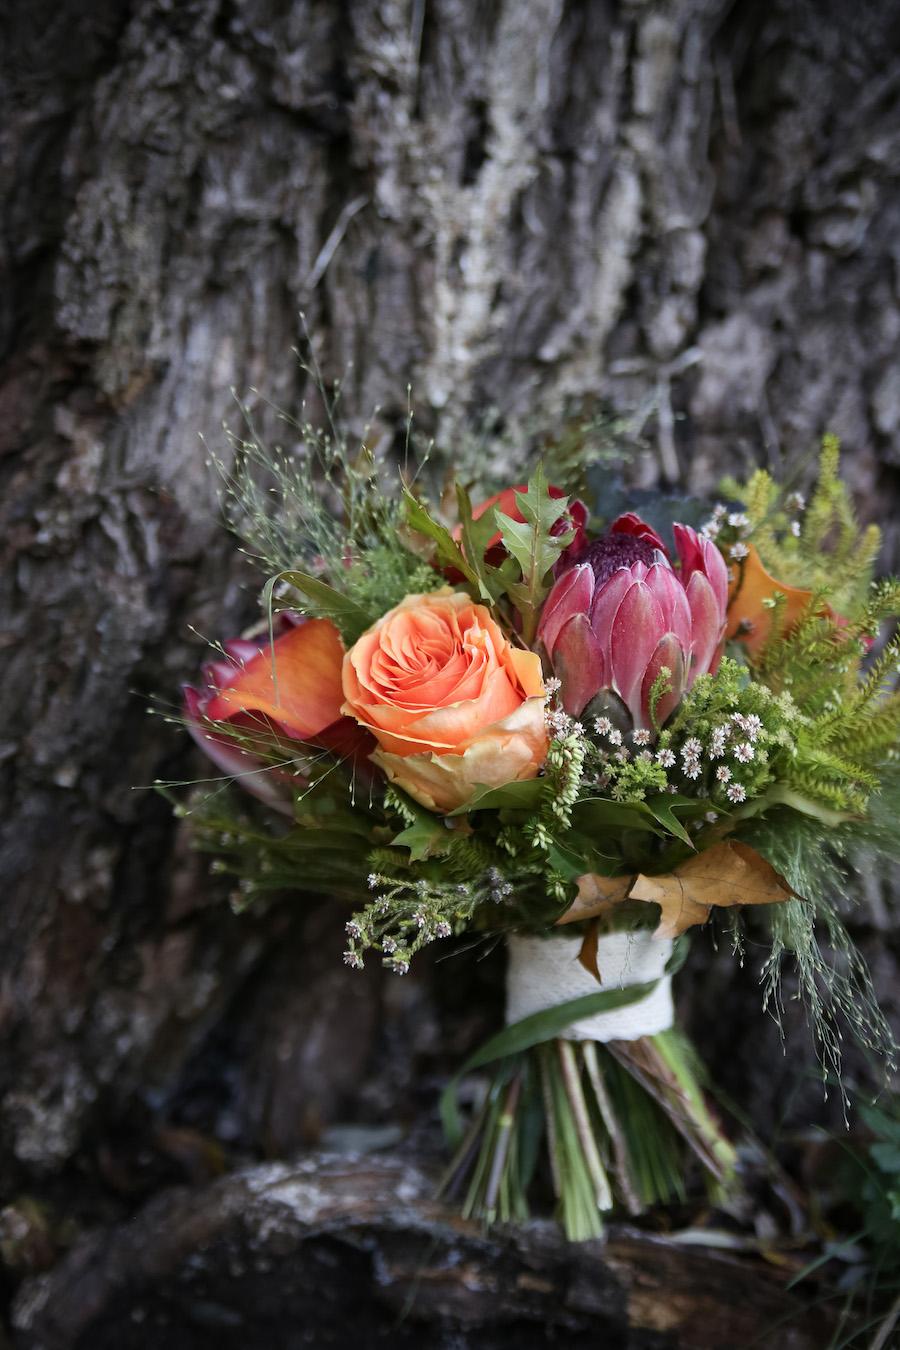 matrimonio-in-autunno-fil-blanc-20